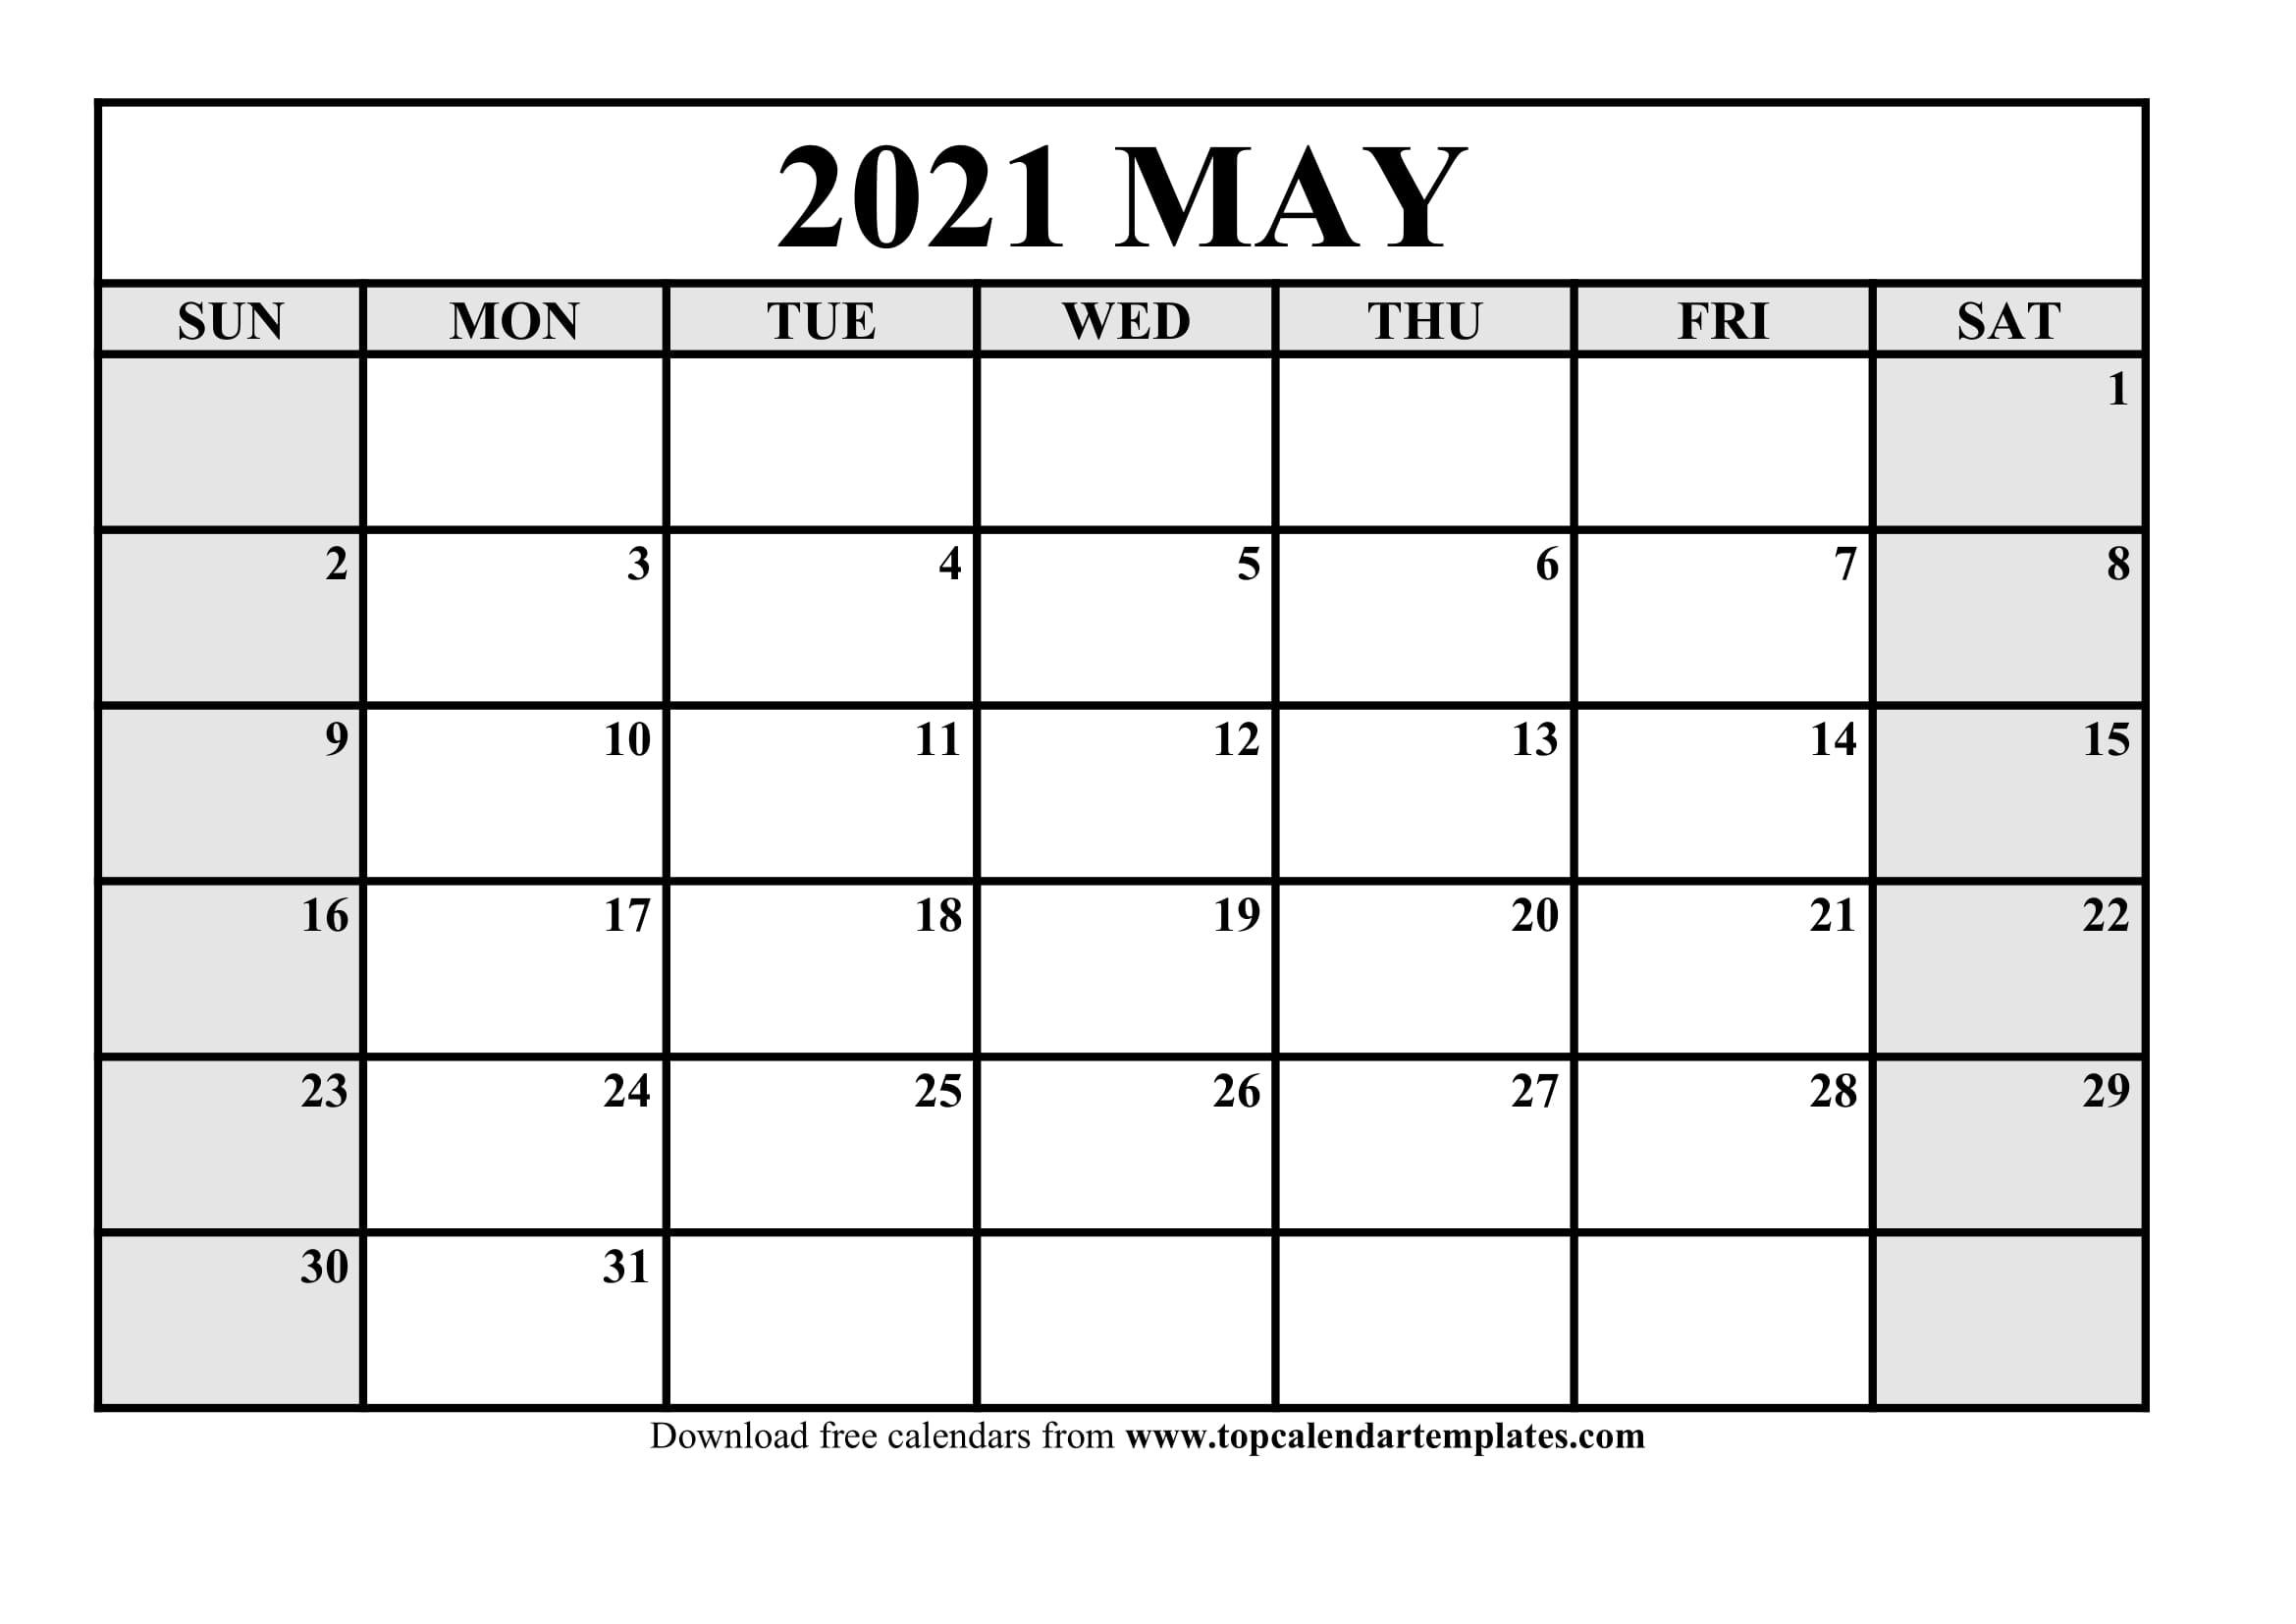 Free May 2021 Printable Calendar In Editable Format